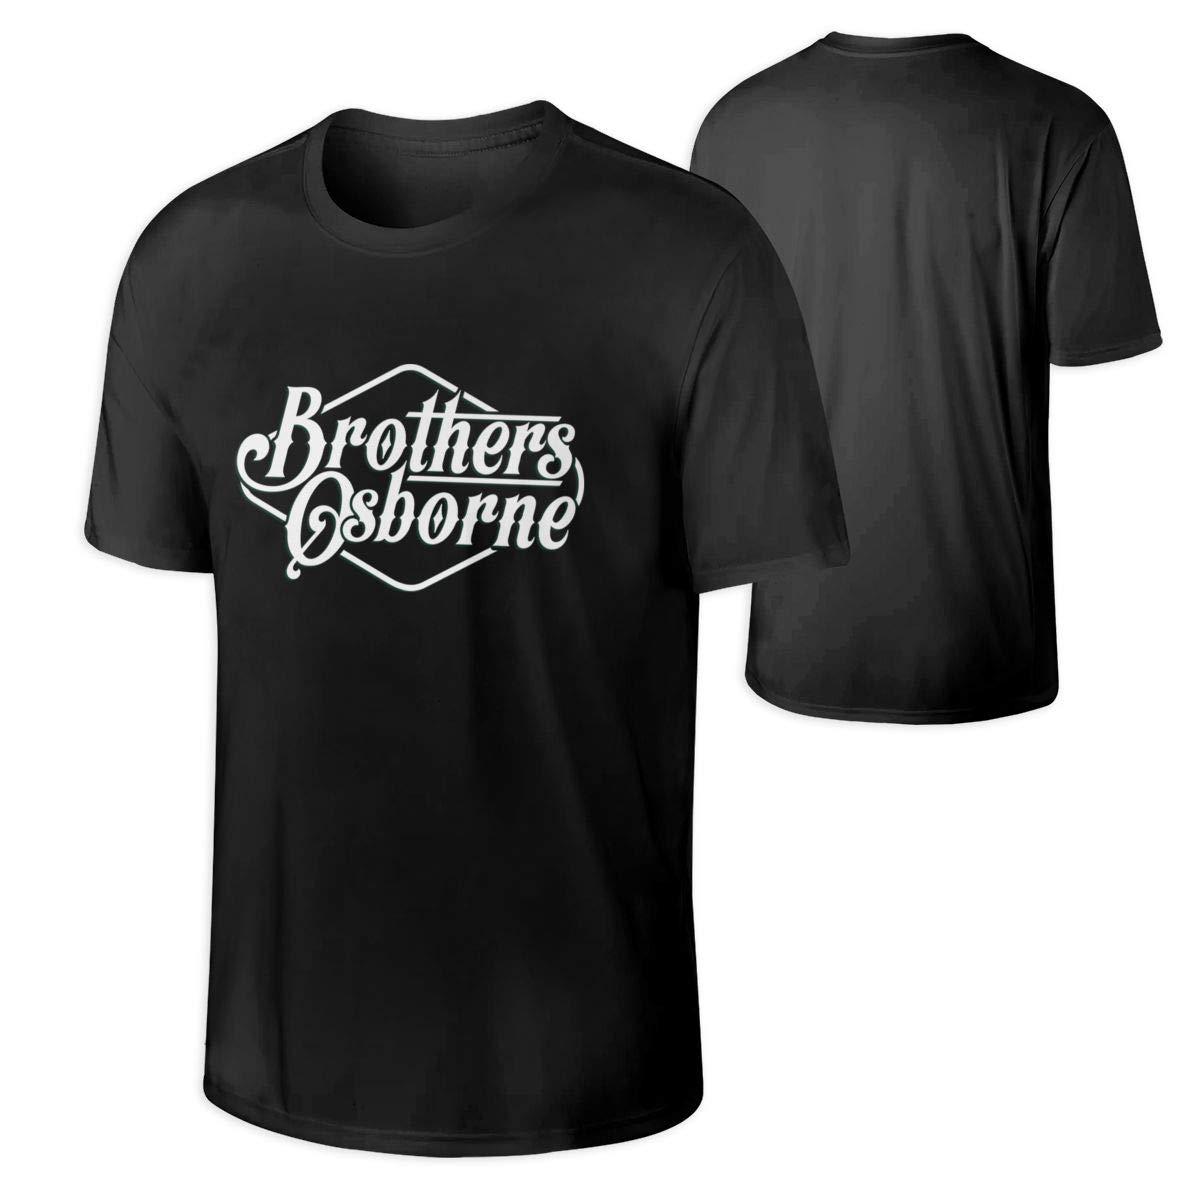 Brothers Osborne S Short Sleeves Tshirt Gift